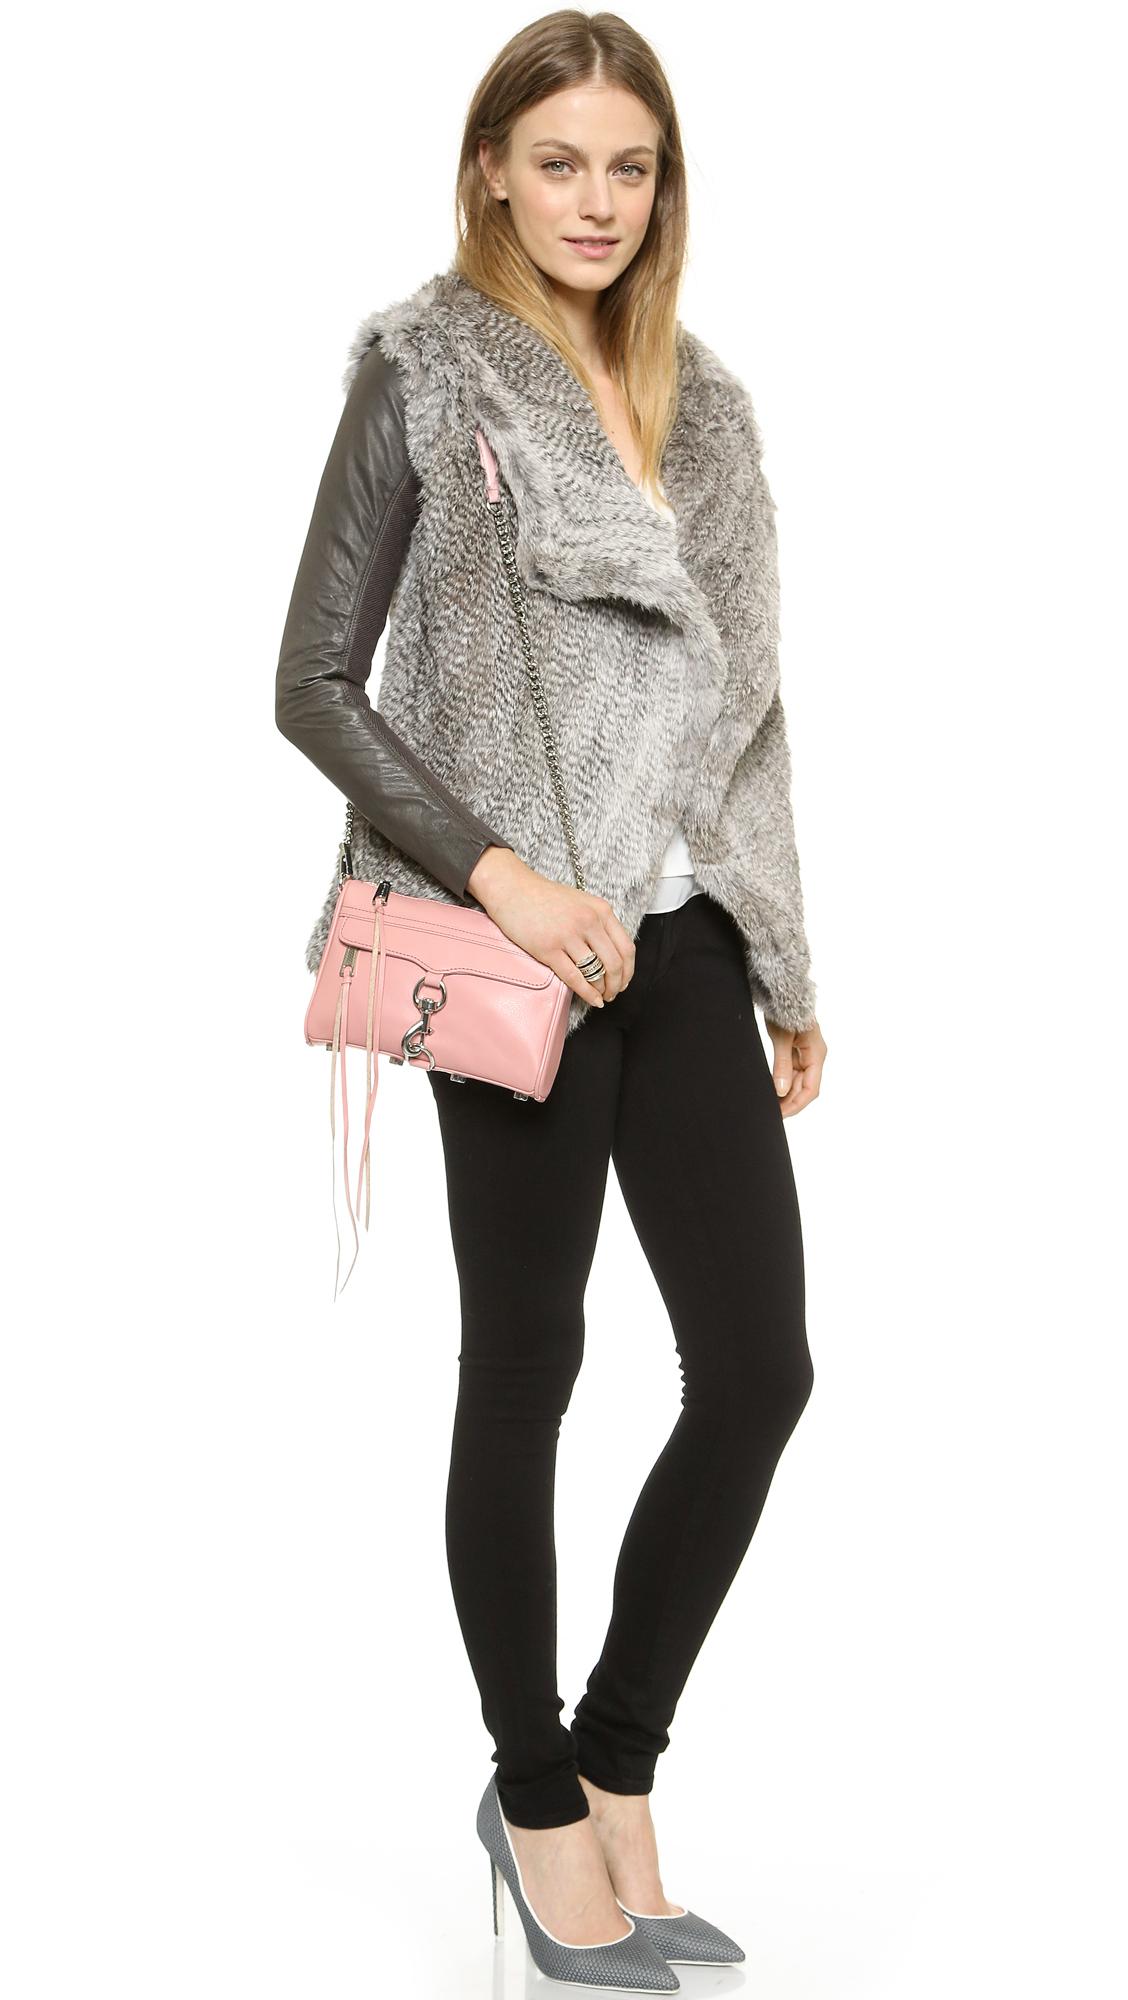 Lyst - Rebecca minkoff Love Cross Body Bag in Pink